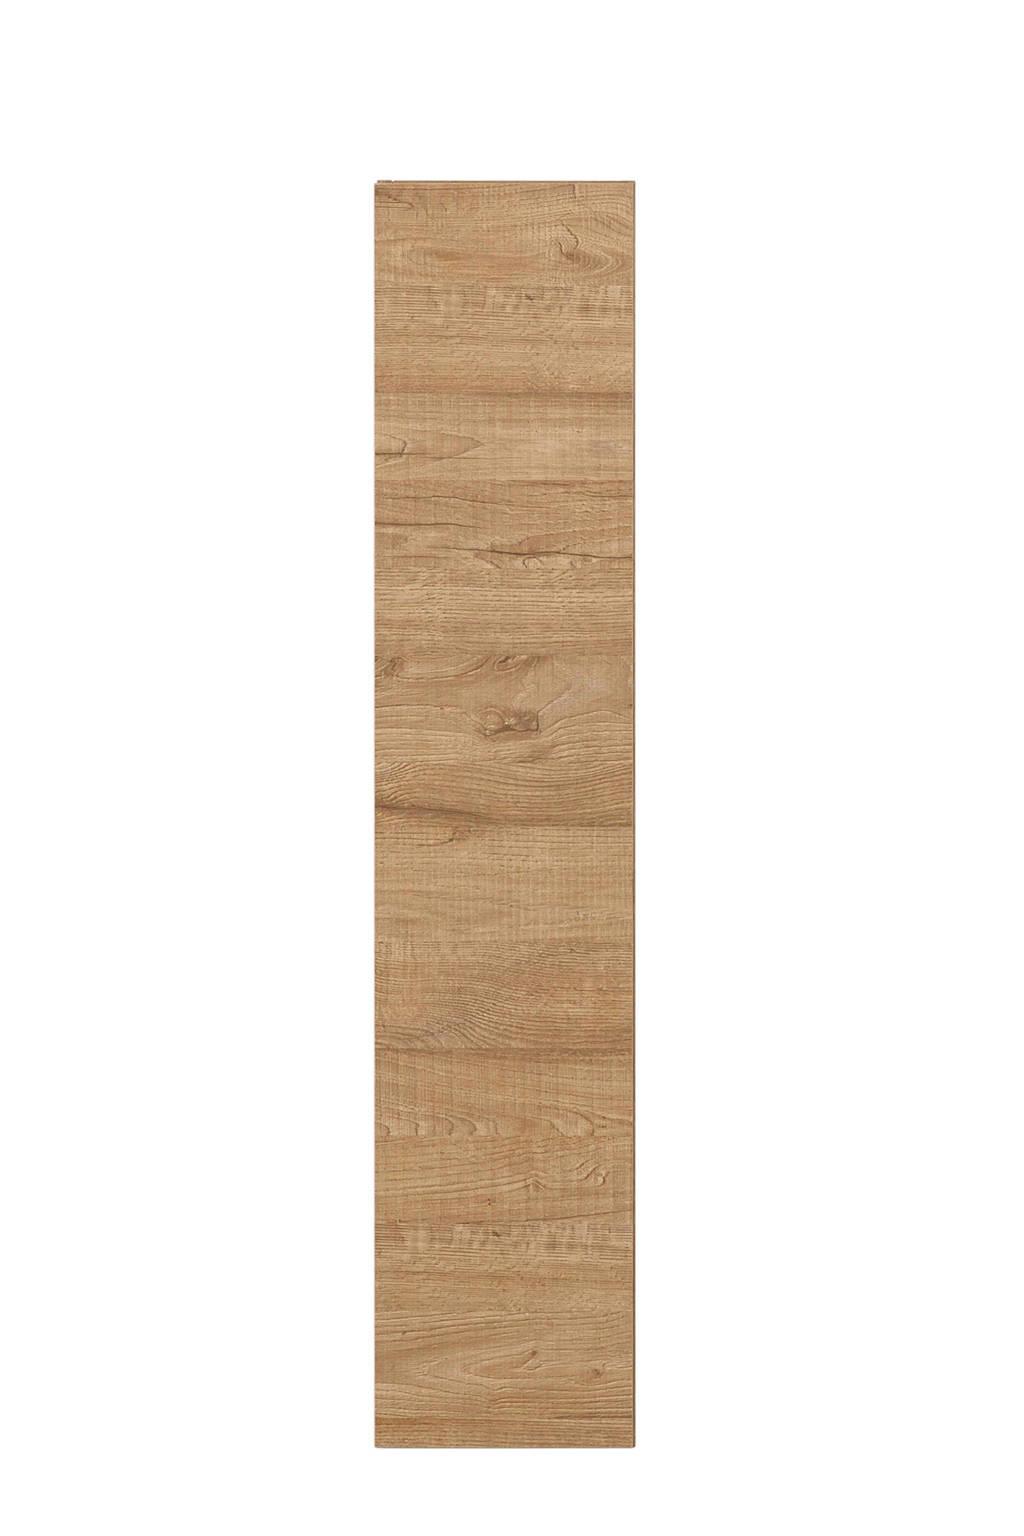 Wandkast CUBE, Eiken / honing